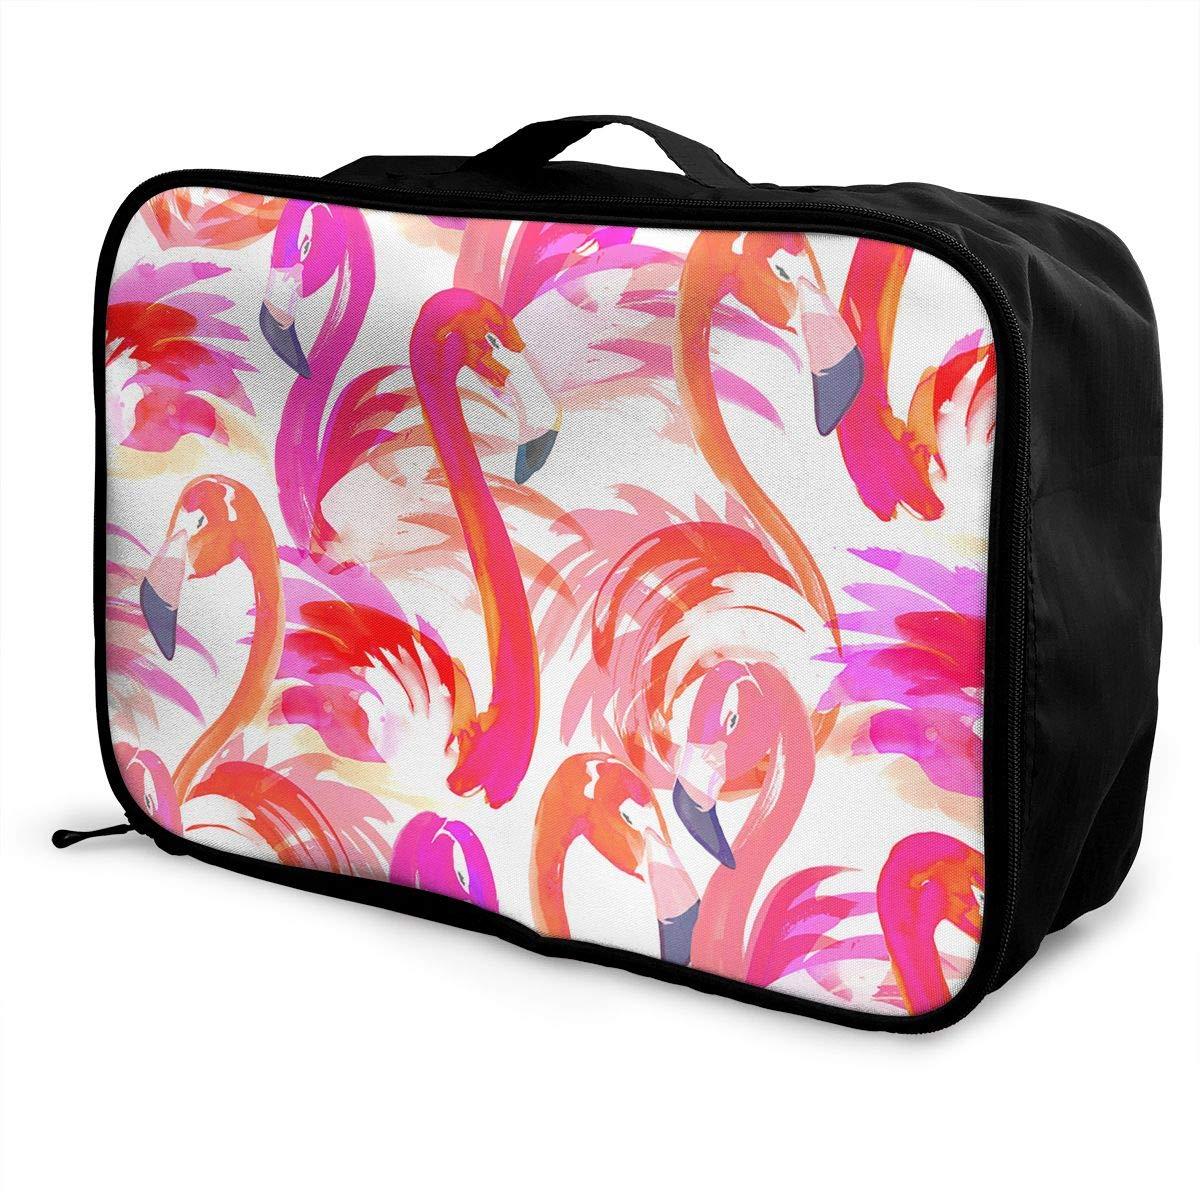 Travel Luggage Duffle Bag Lightweight Portable Handbag Watercolor Flamingo Print Large Capacity Waterproof Foldable Storage Tote